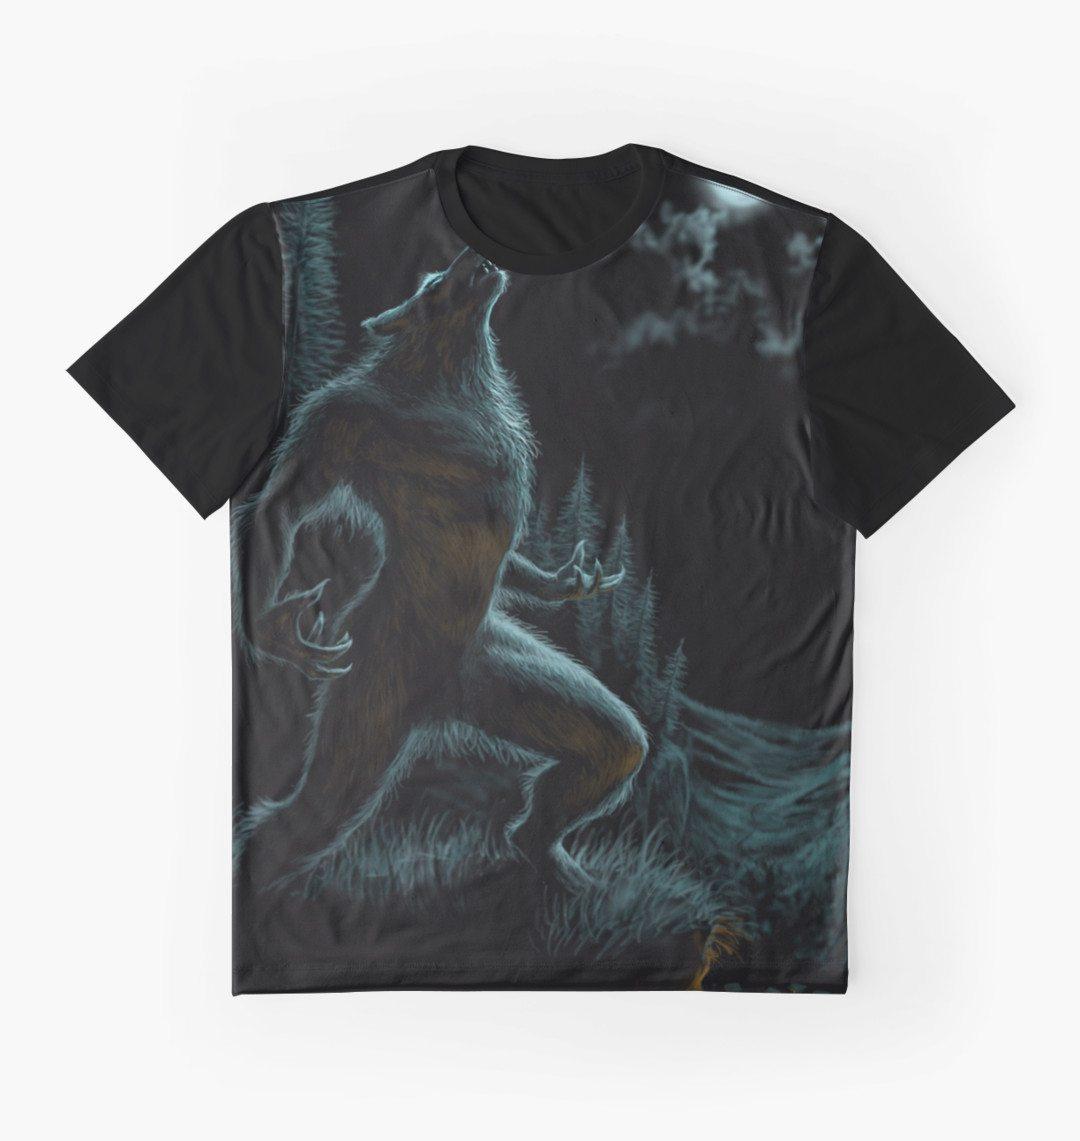 Howl of the Werewolf